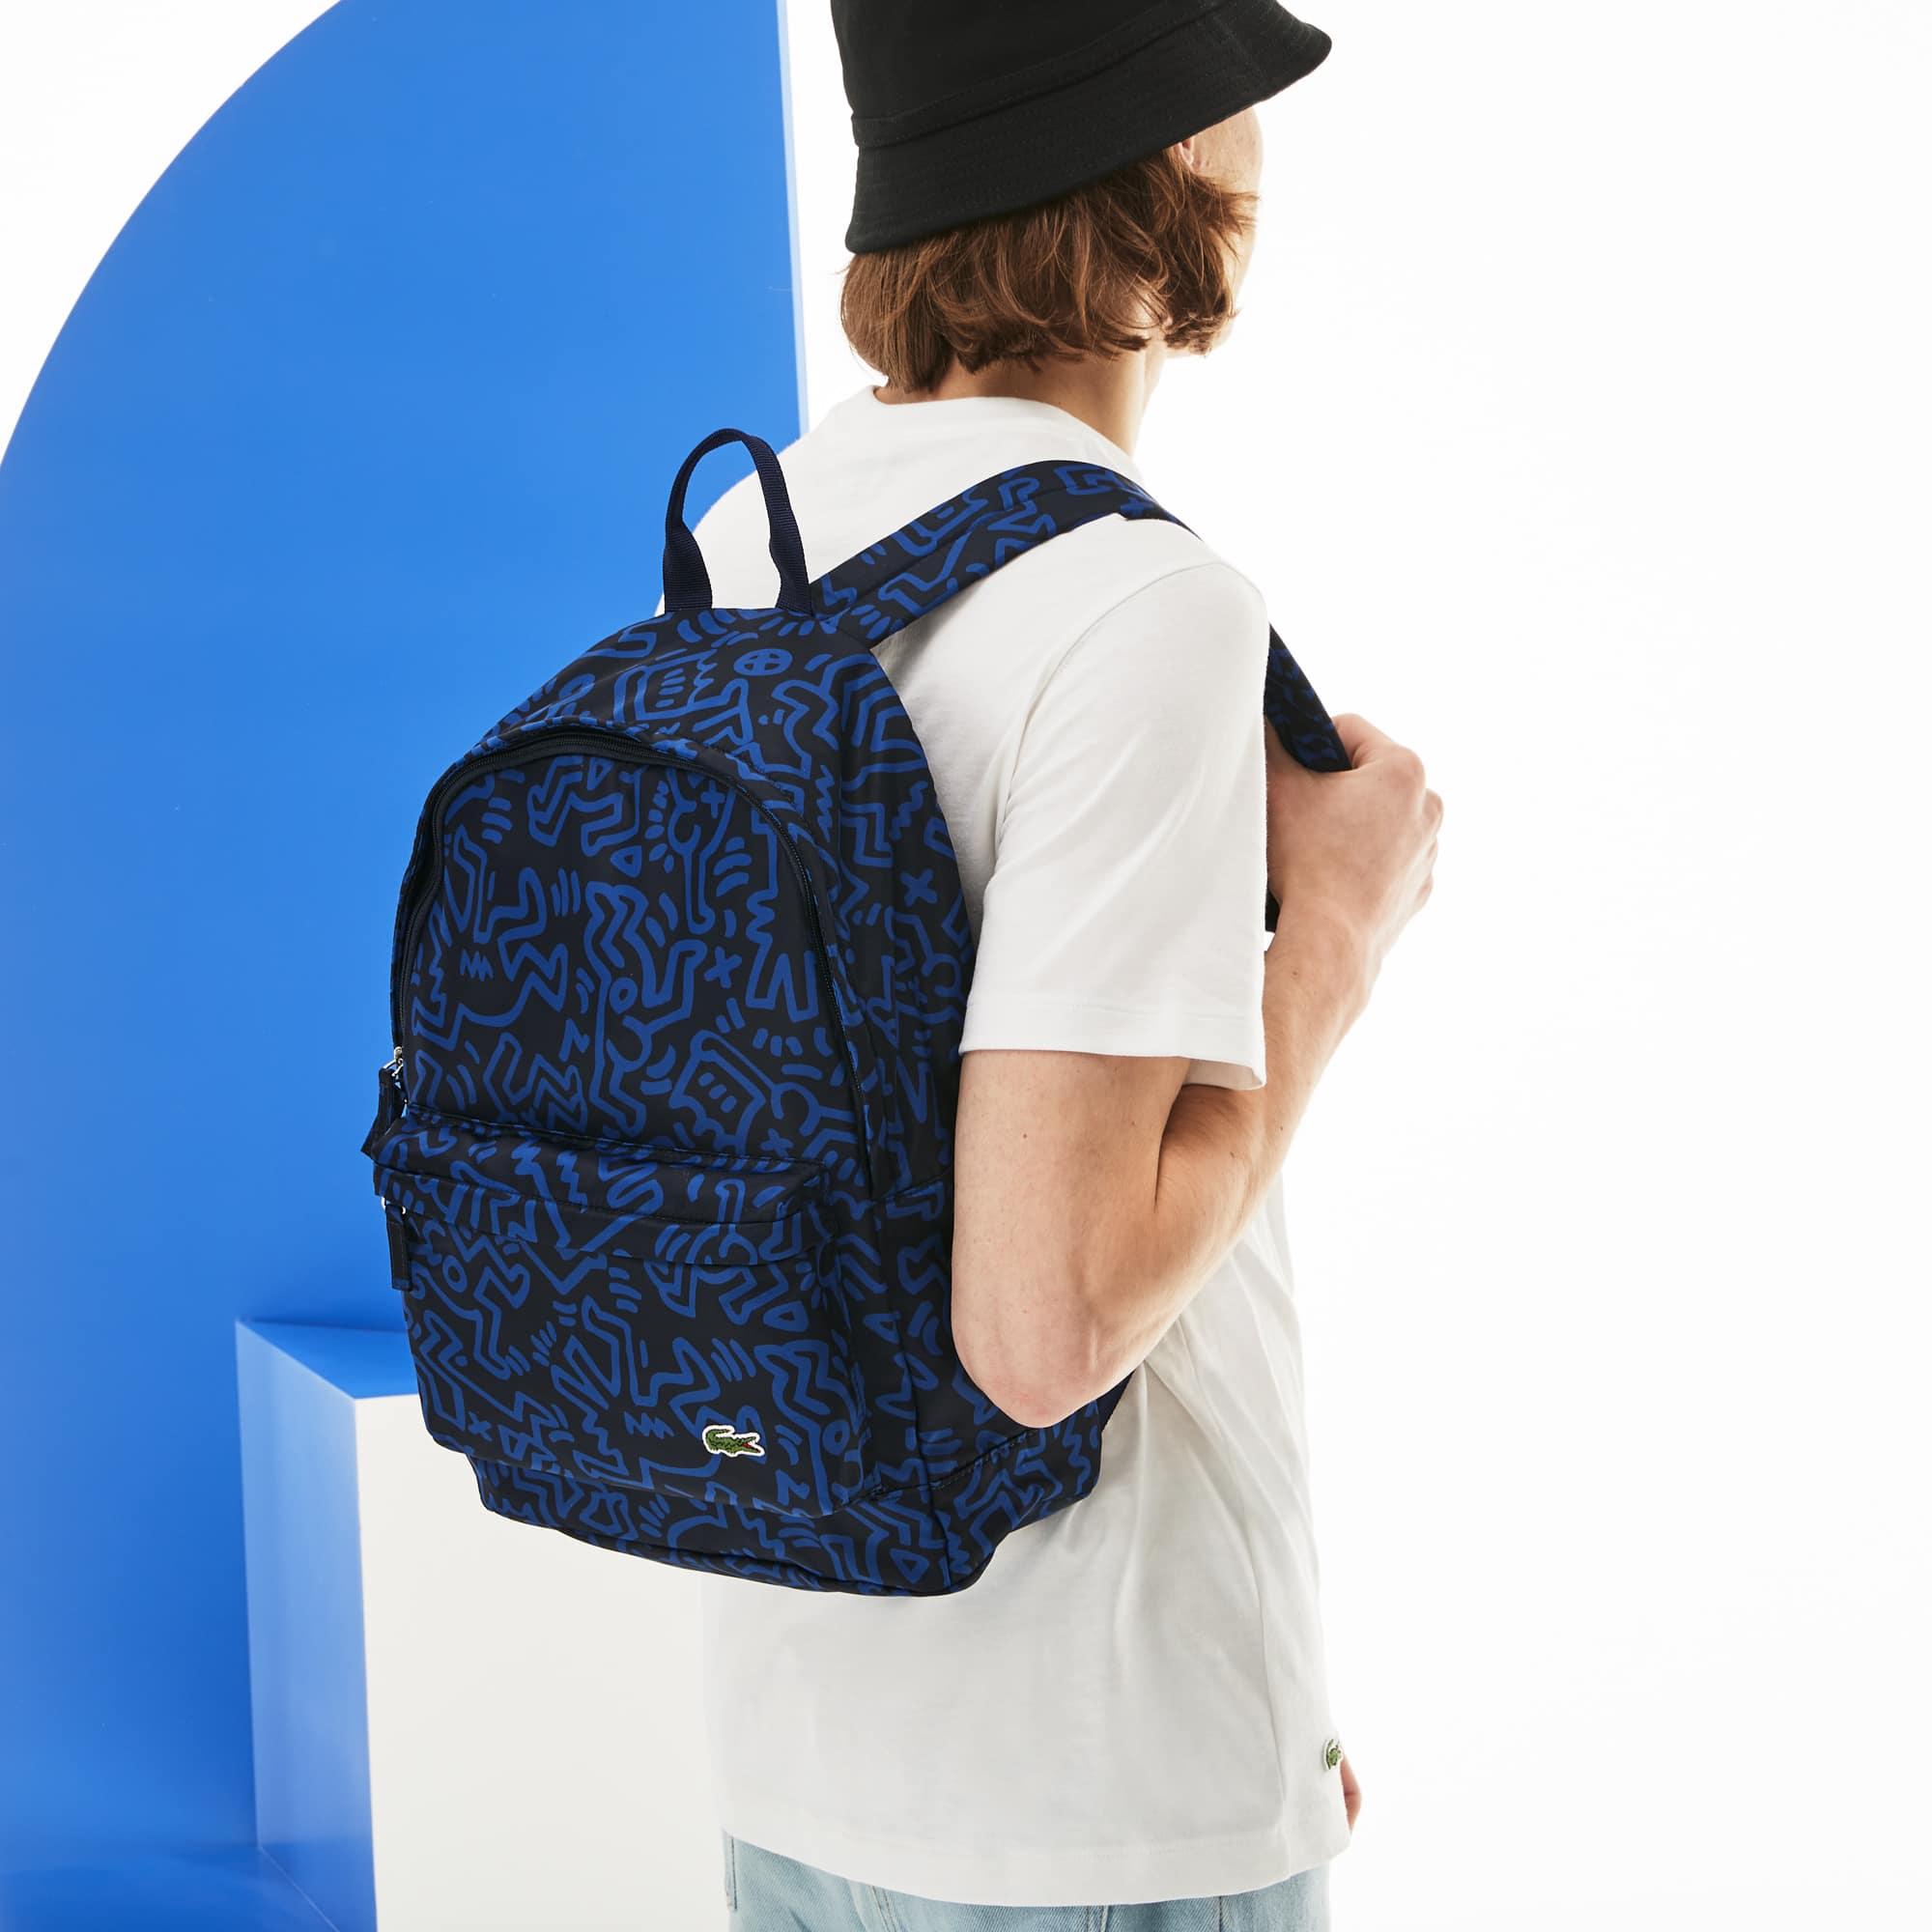 ddacef8abe4 Lacoste x Keith Haring